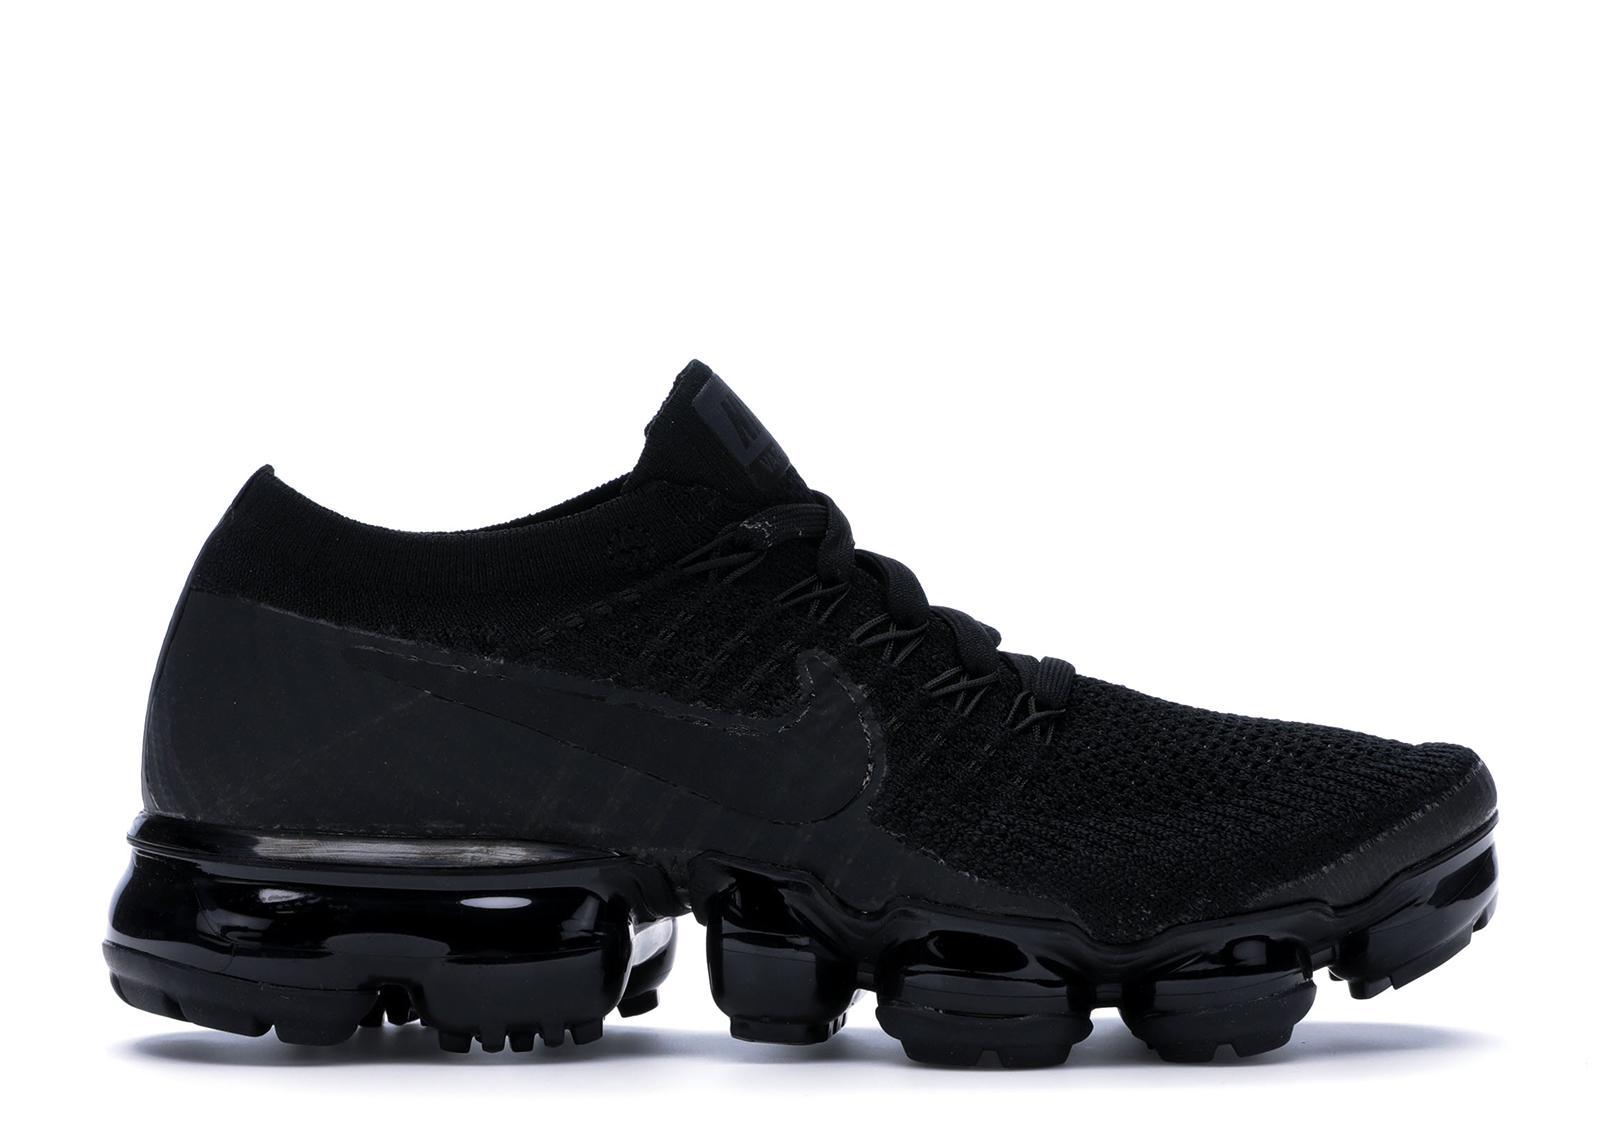 Nike Air Vapormax Triple Noir (w) in